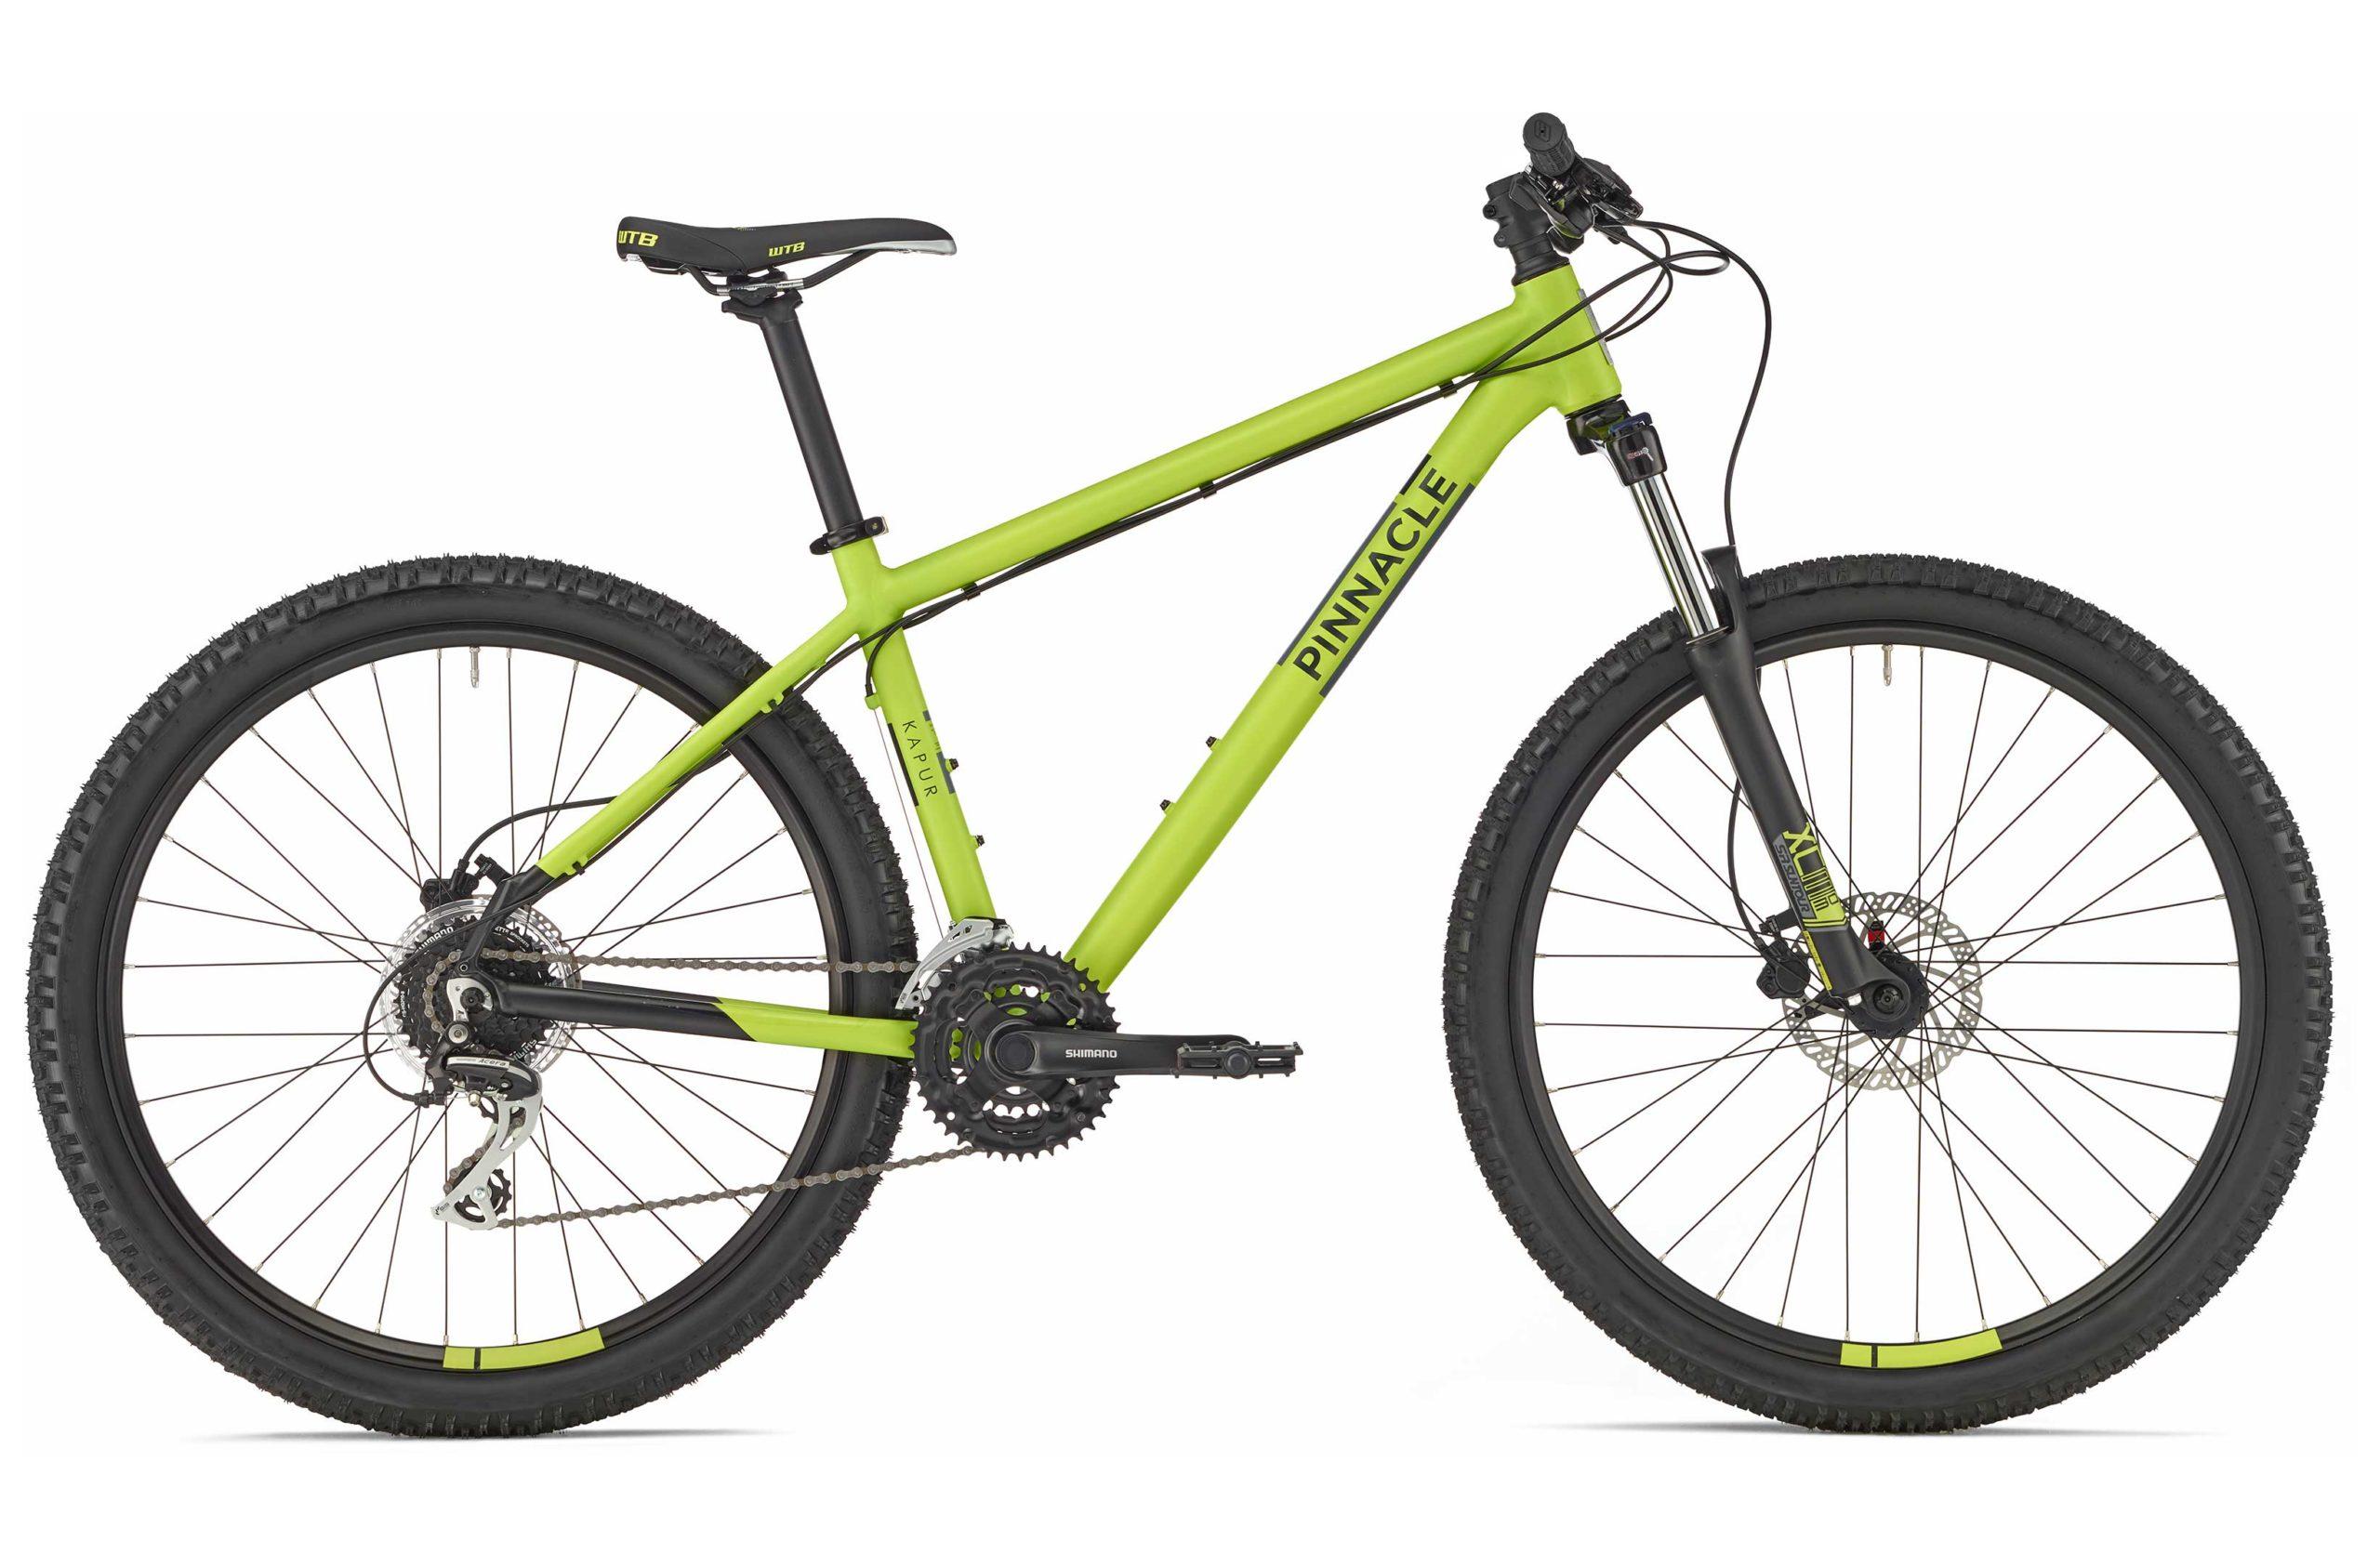 Pinnacle Kapur mountain bike